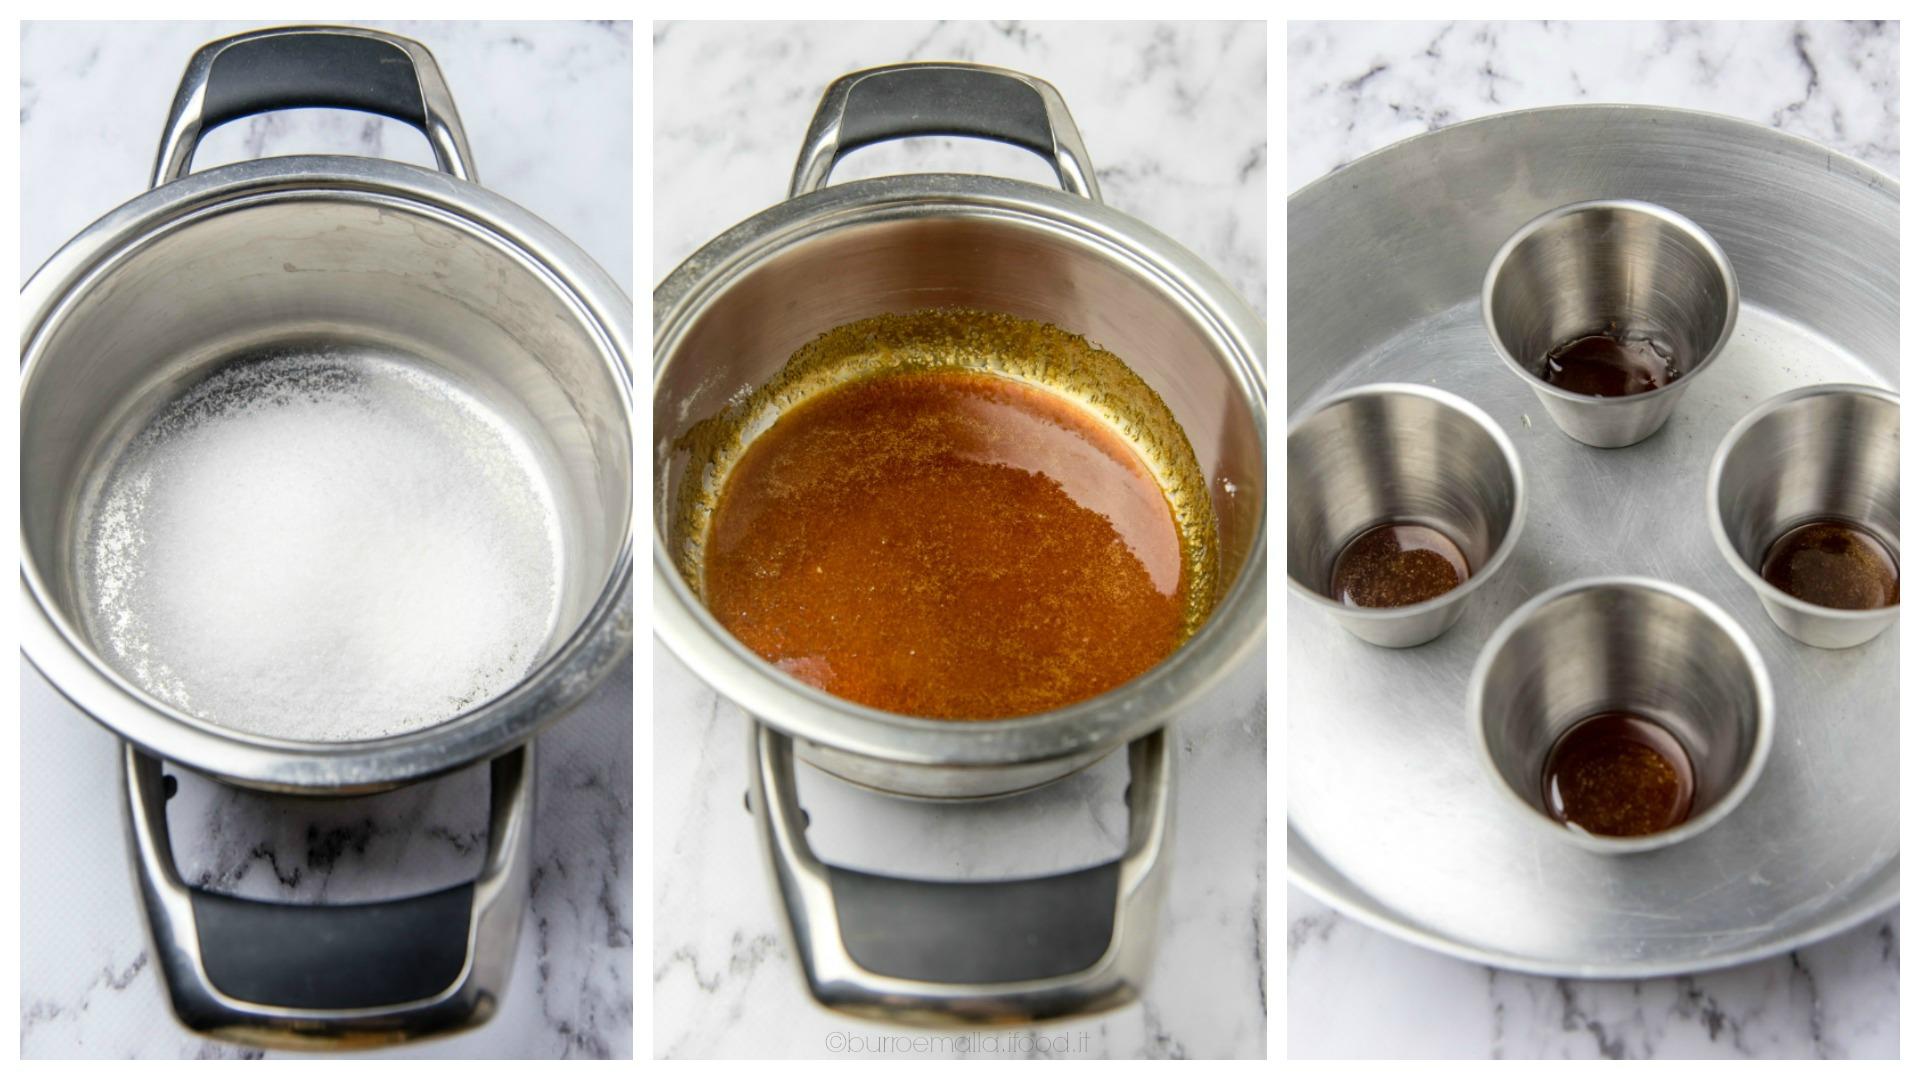 creme-caramel-al-negativo-3